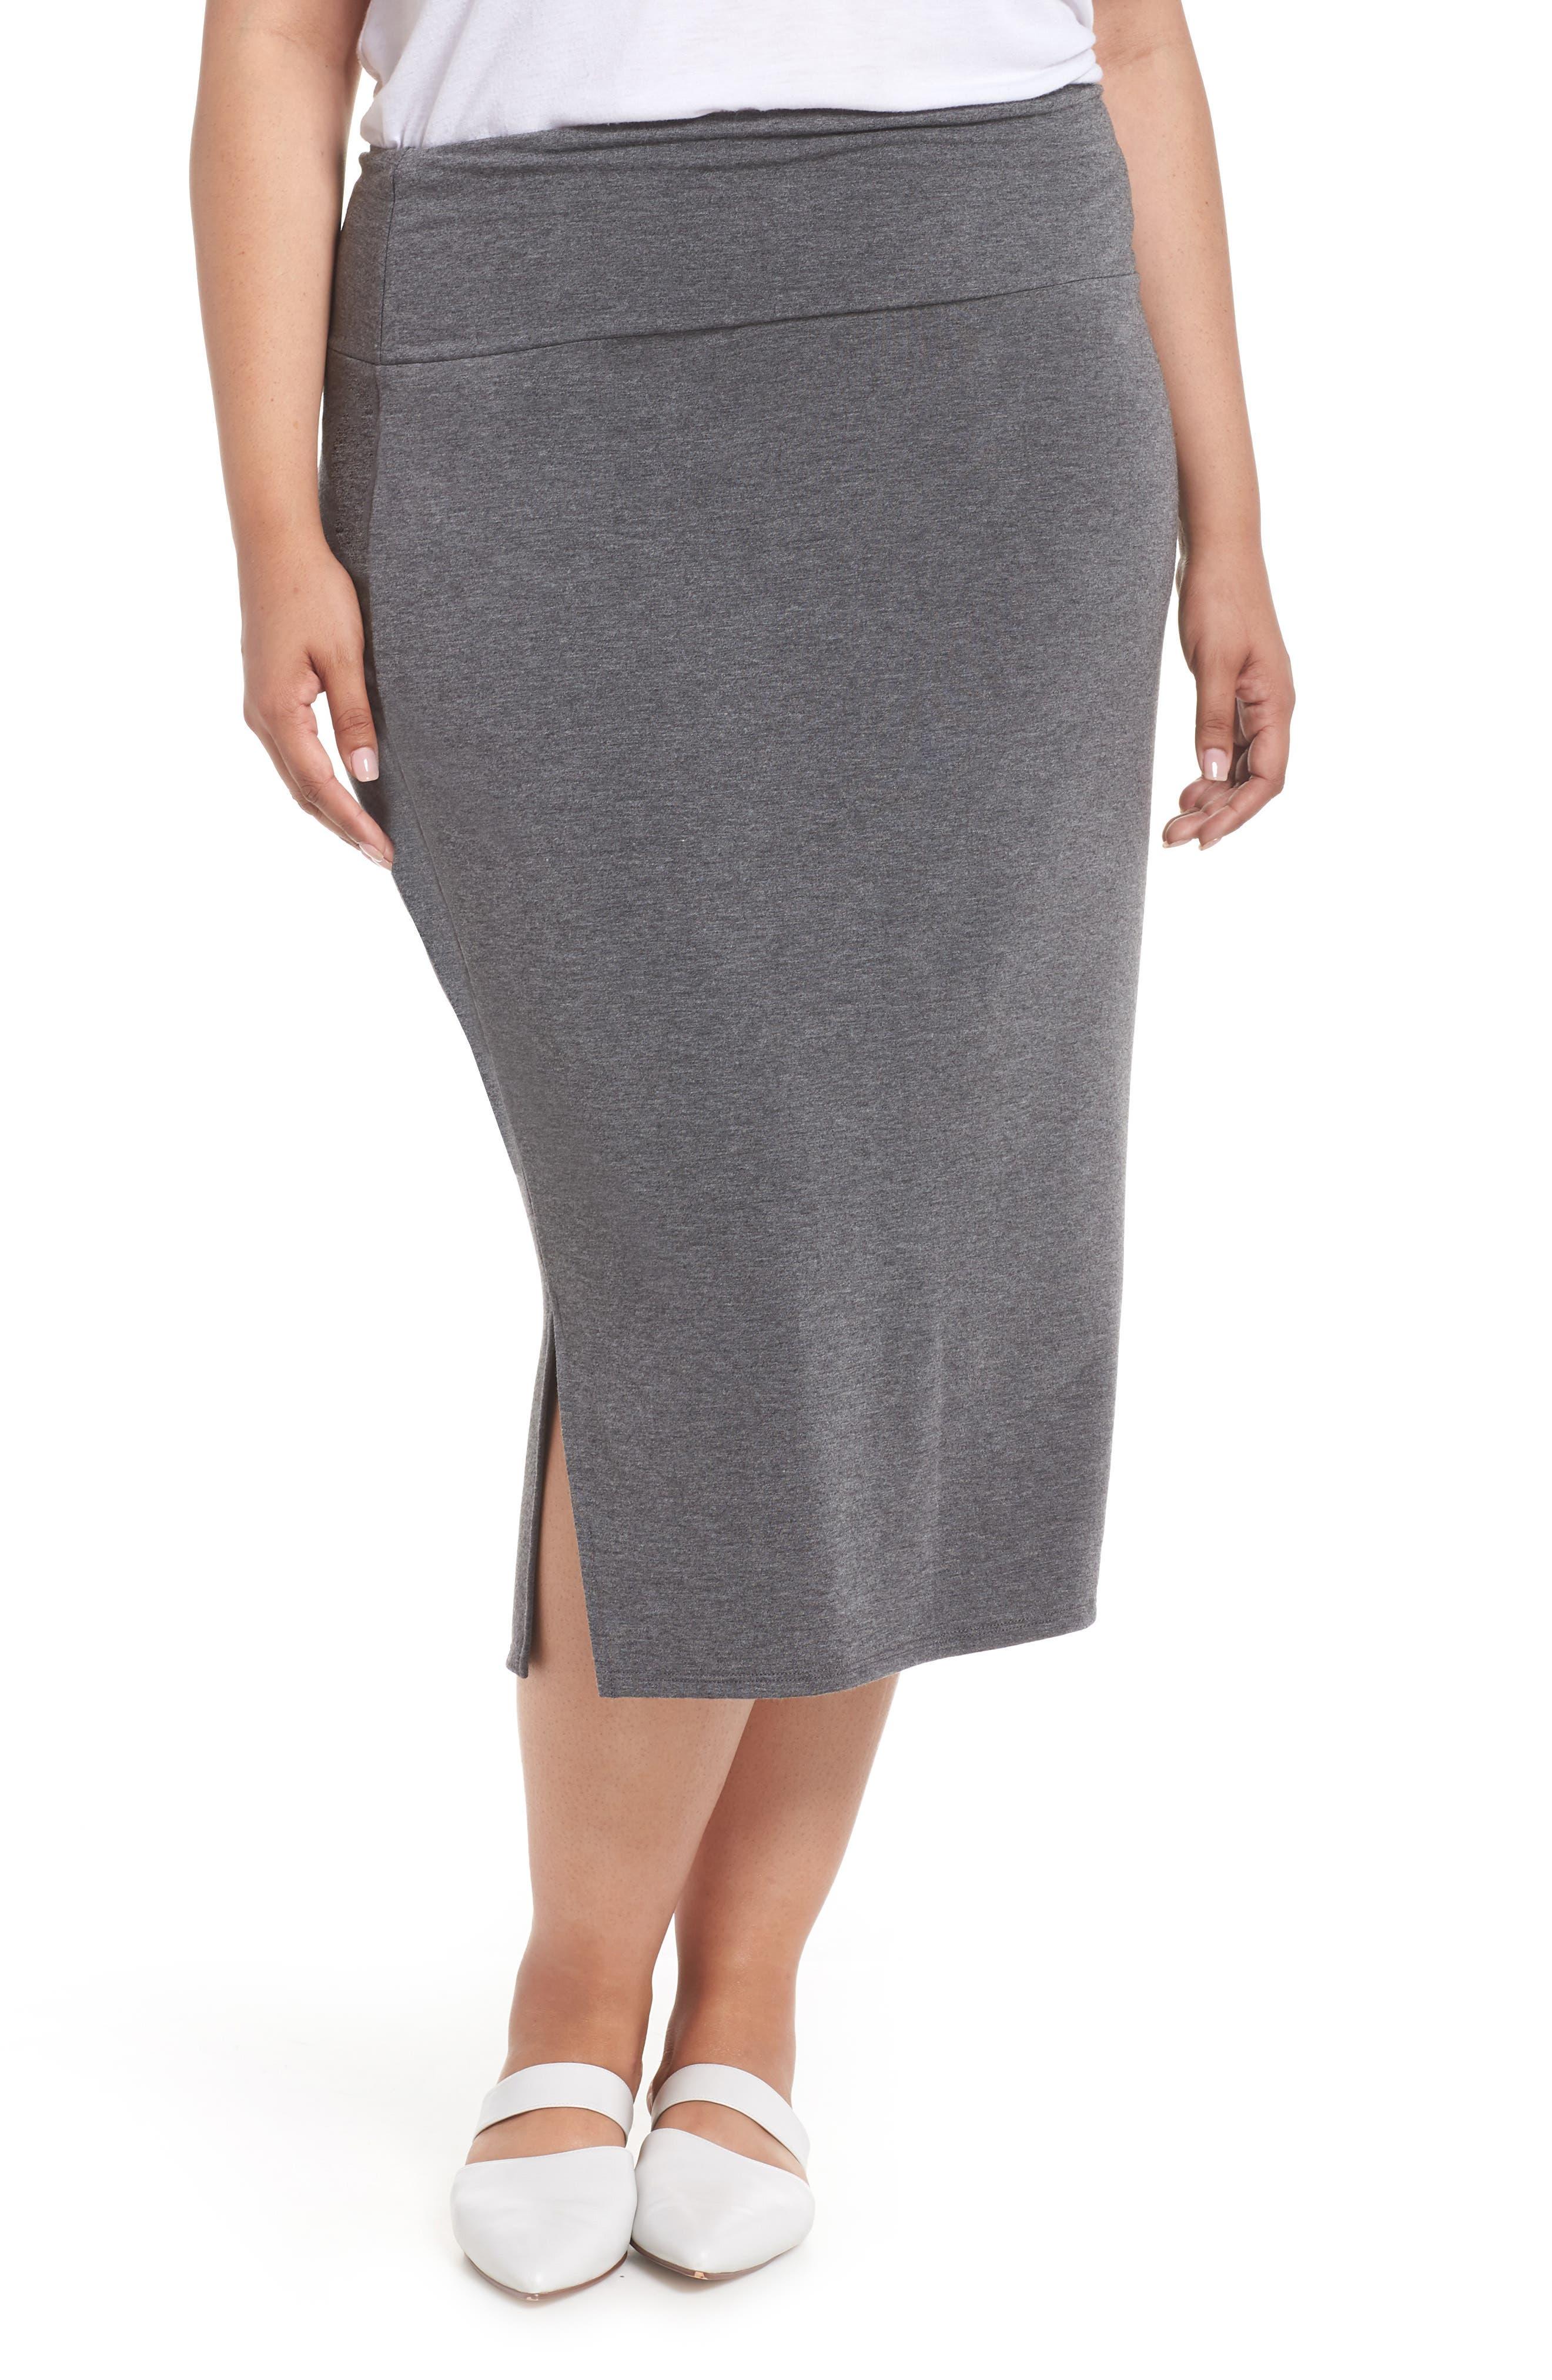 Off Duty Knit Skirt,                             Main thumbnail 1, color,                             GREY DARK CHARCOAL HEATHER